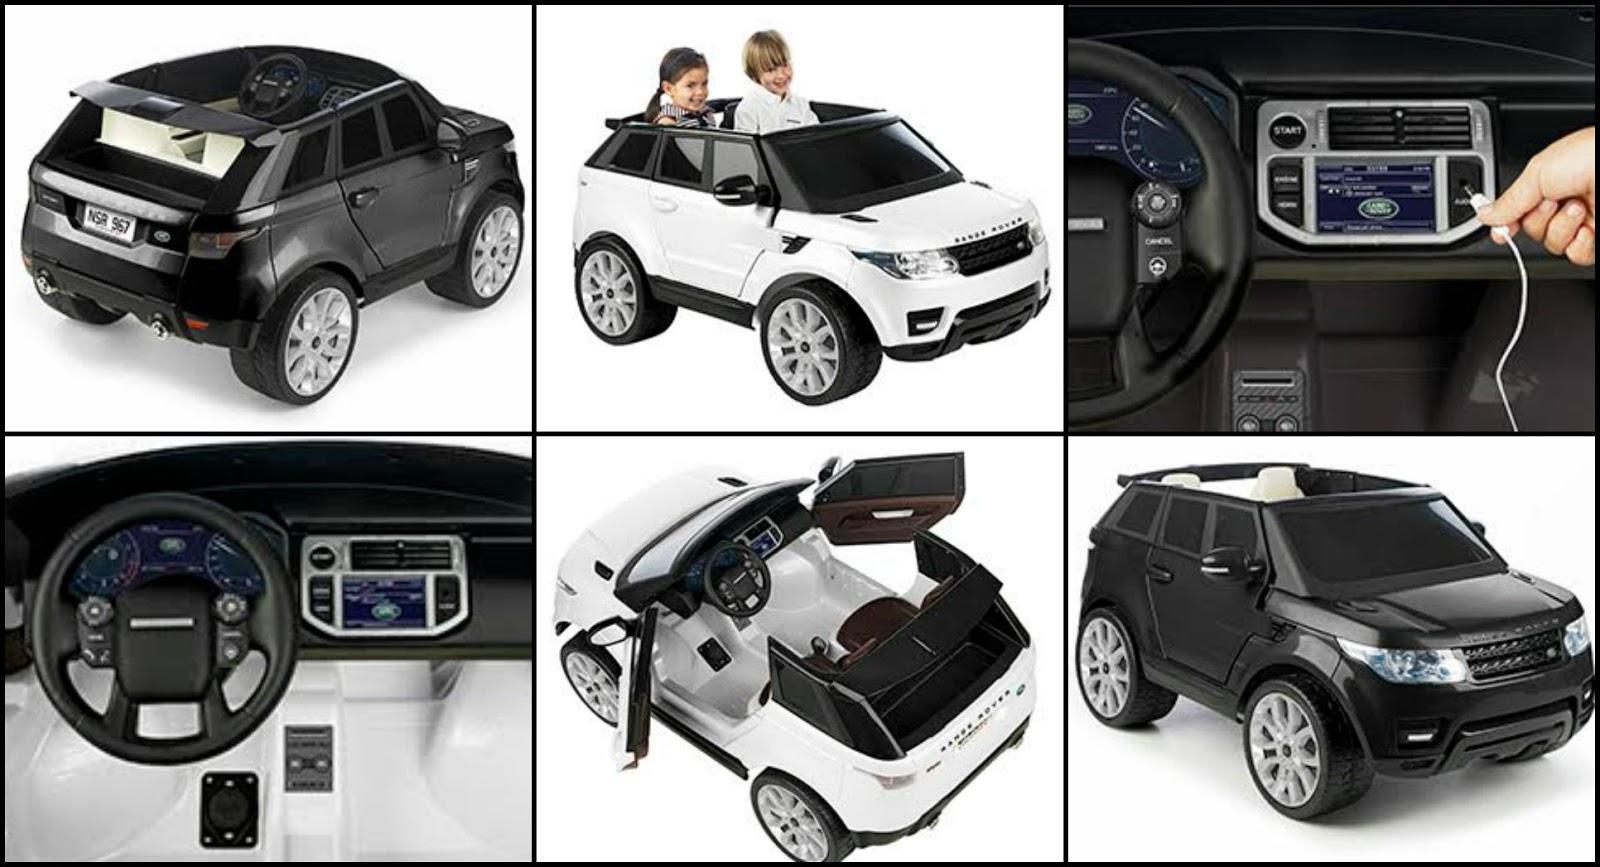 Avigo Range Rover